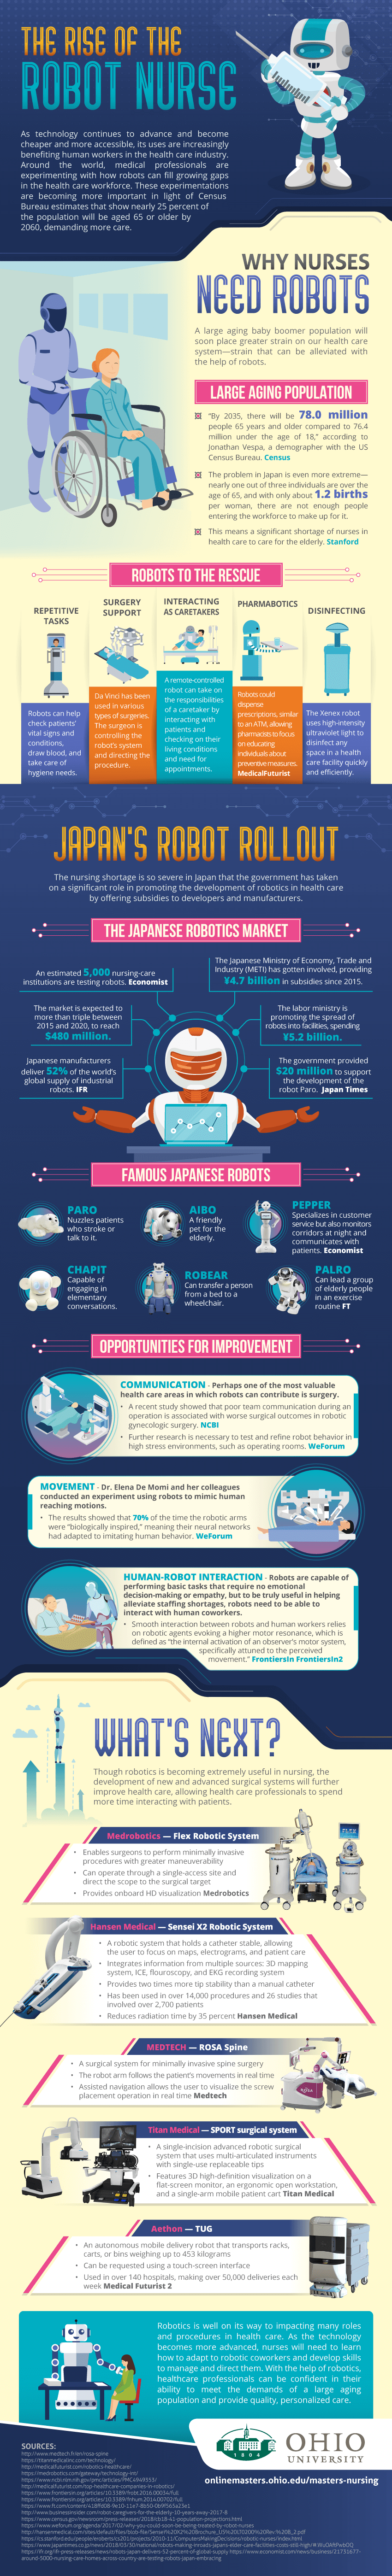 The Rise of the Robot Nurse | Ohio University